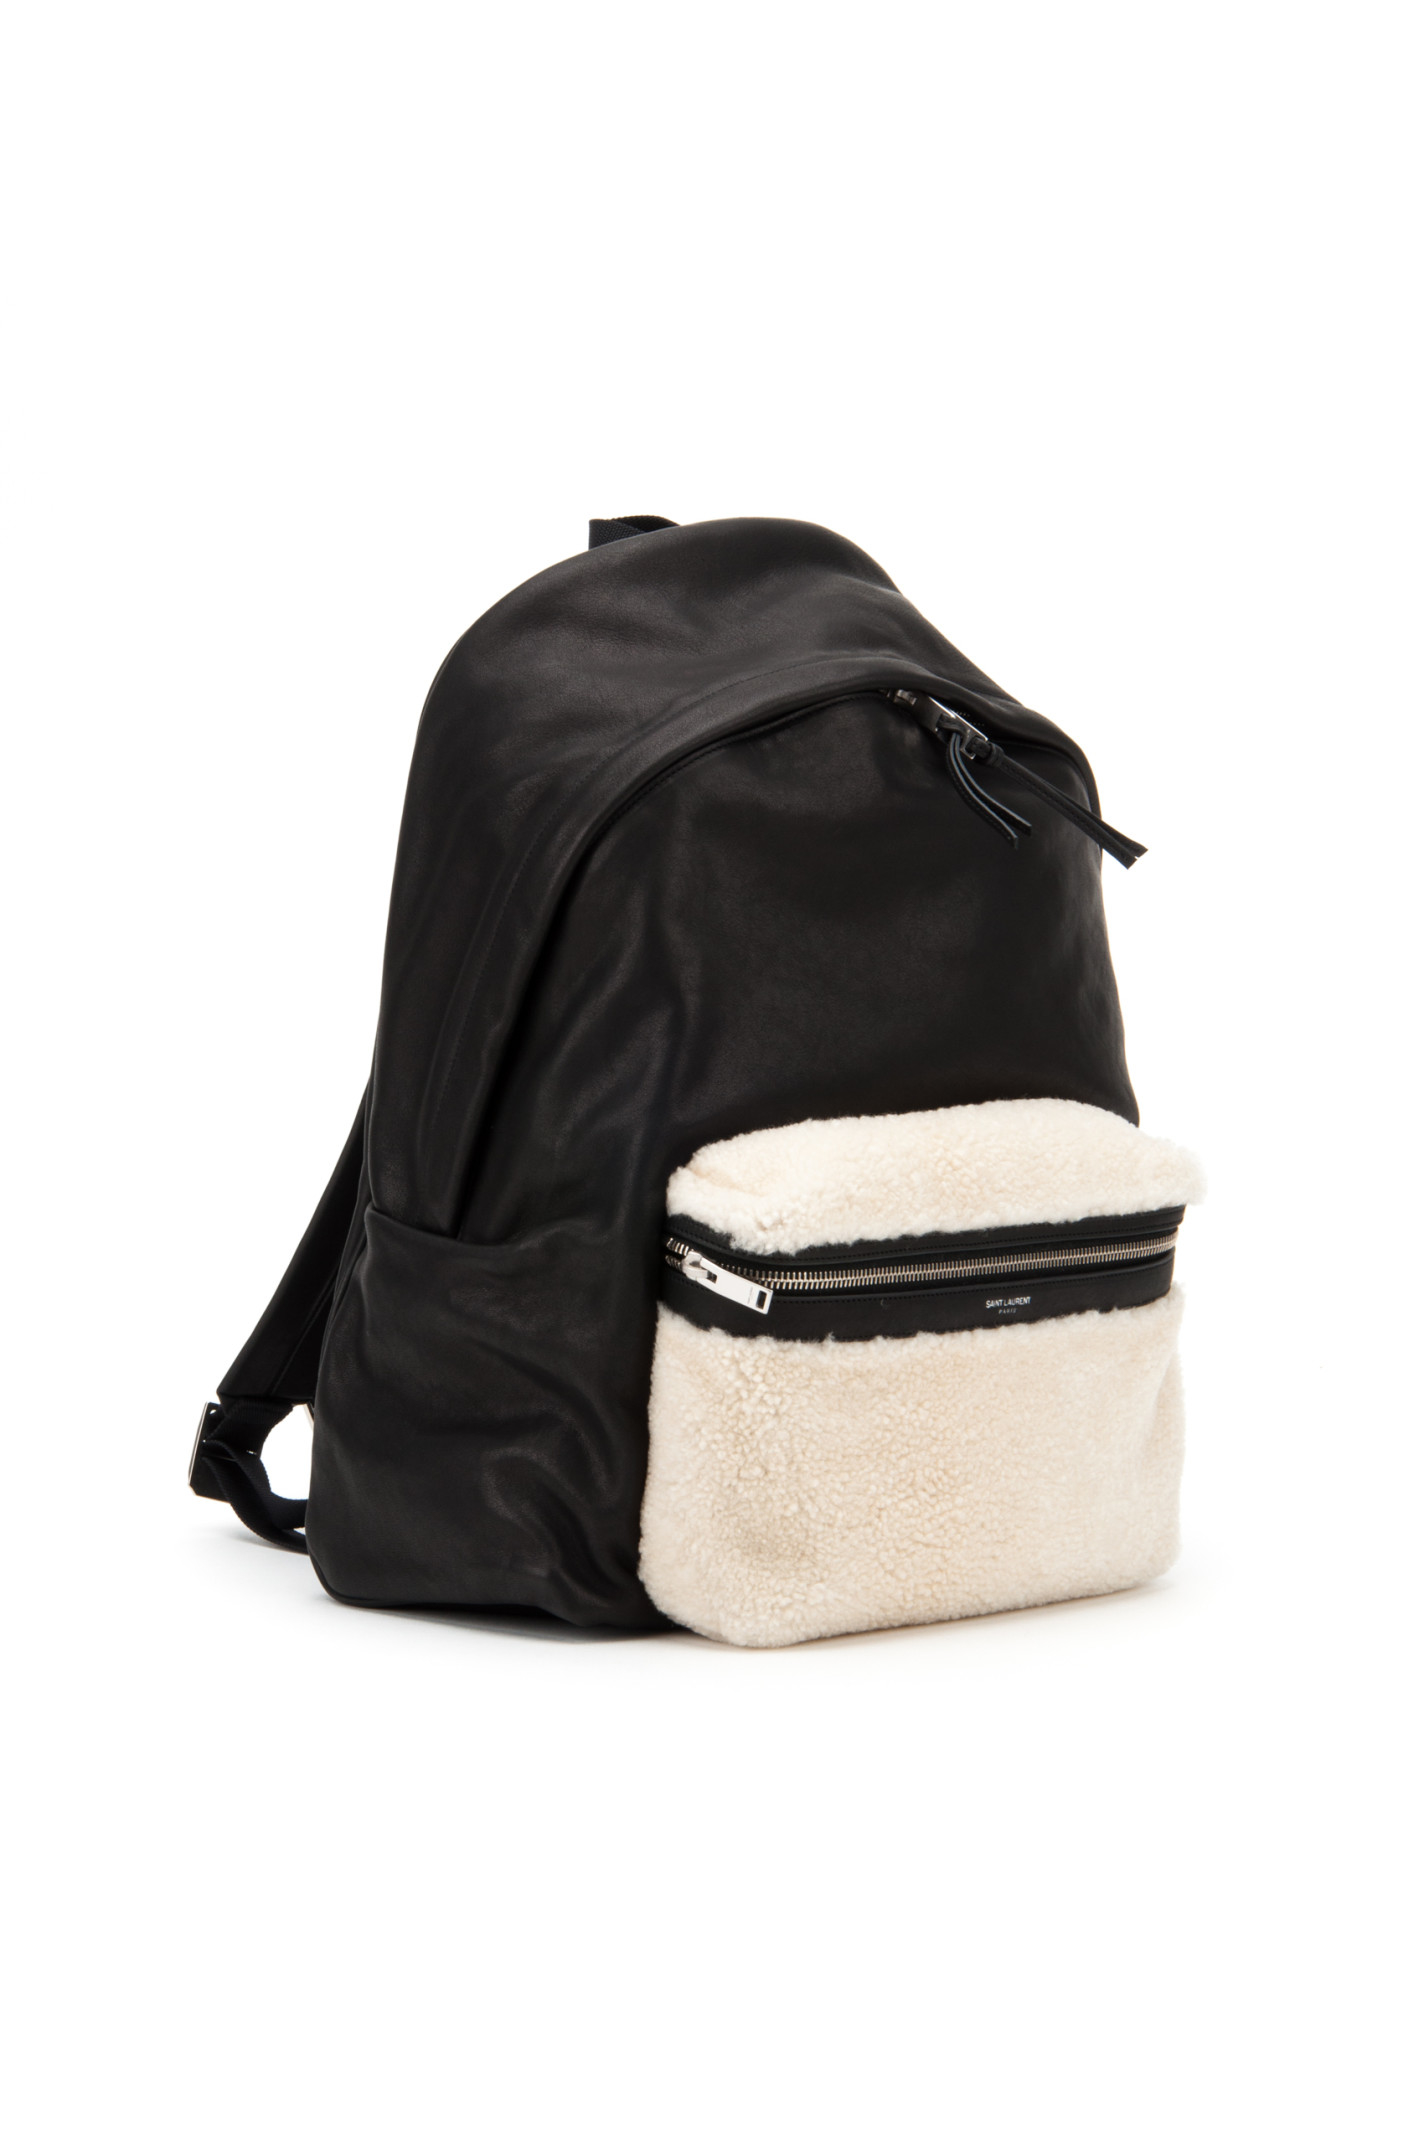 Saint laurent Ysl Delave Hunting Line Tuscany Backpack in Black ...